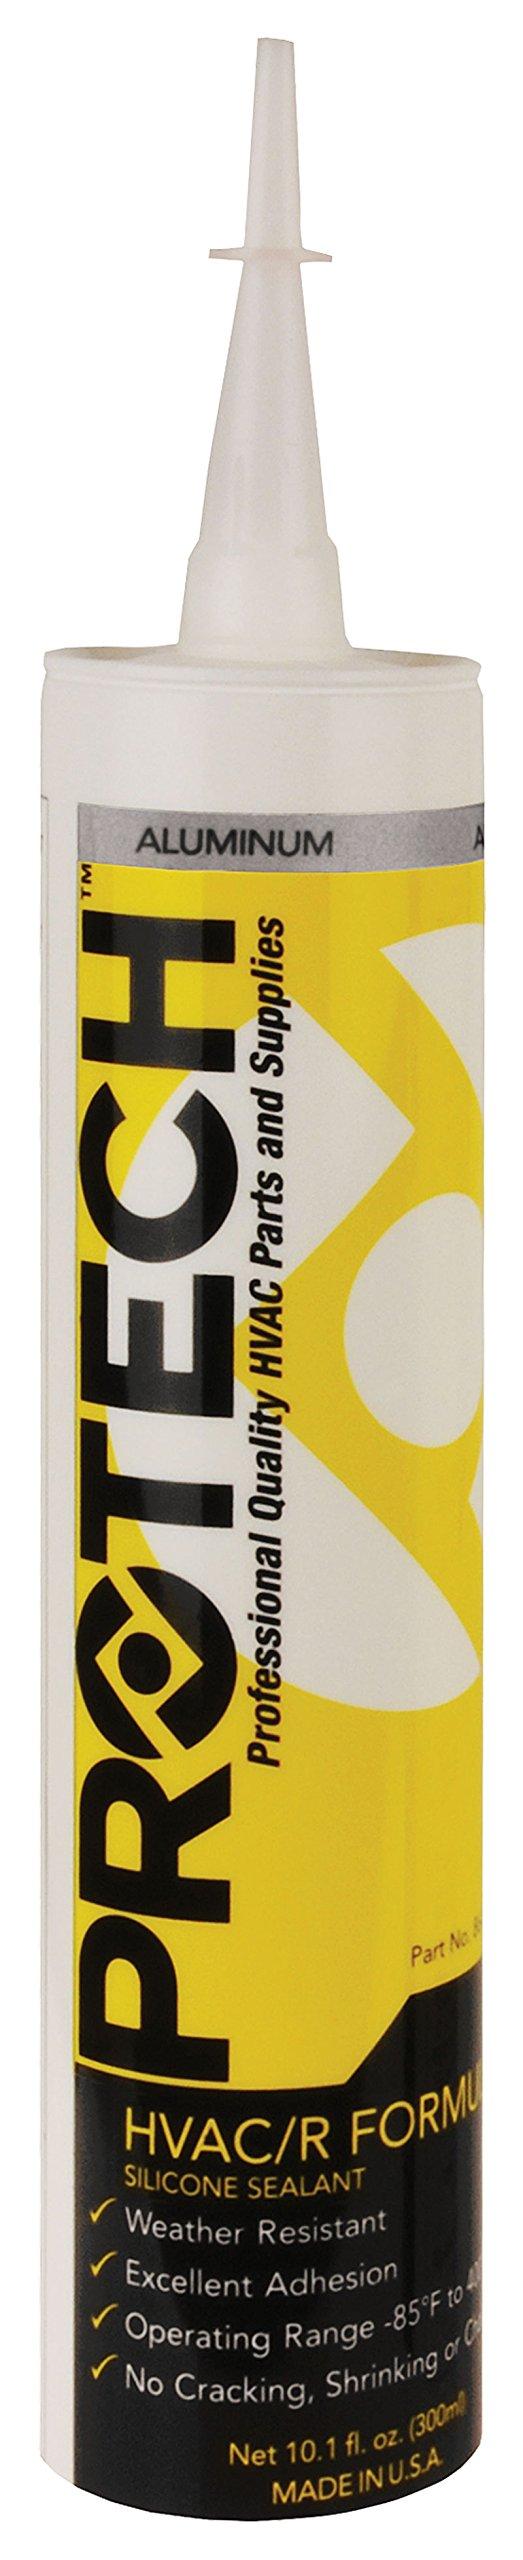 Rheem 370 HVAC/R Silicone - Aluminum (10.1 oz. tube) #86-370A (pack of 12 items) by Rheem